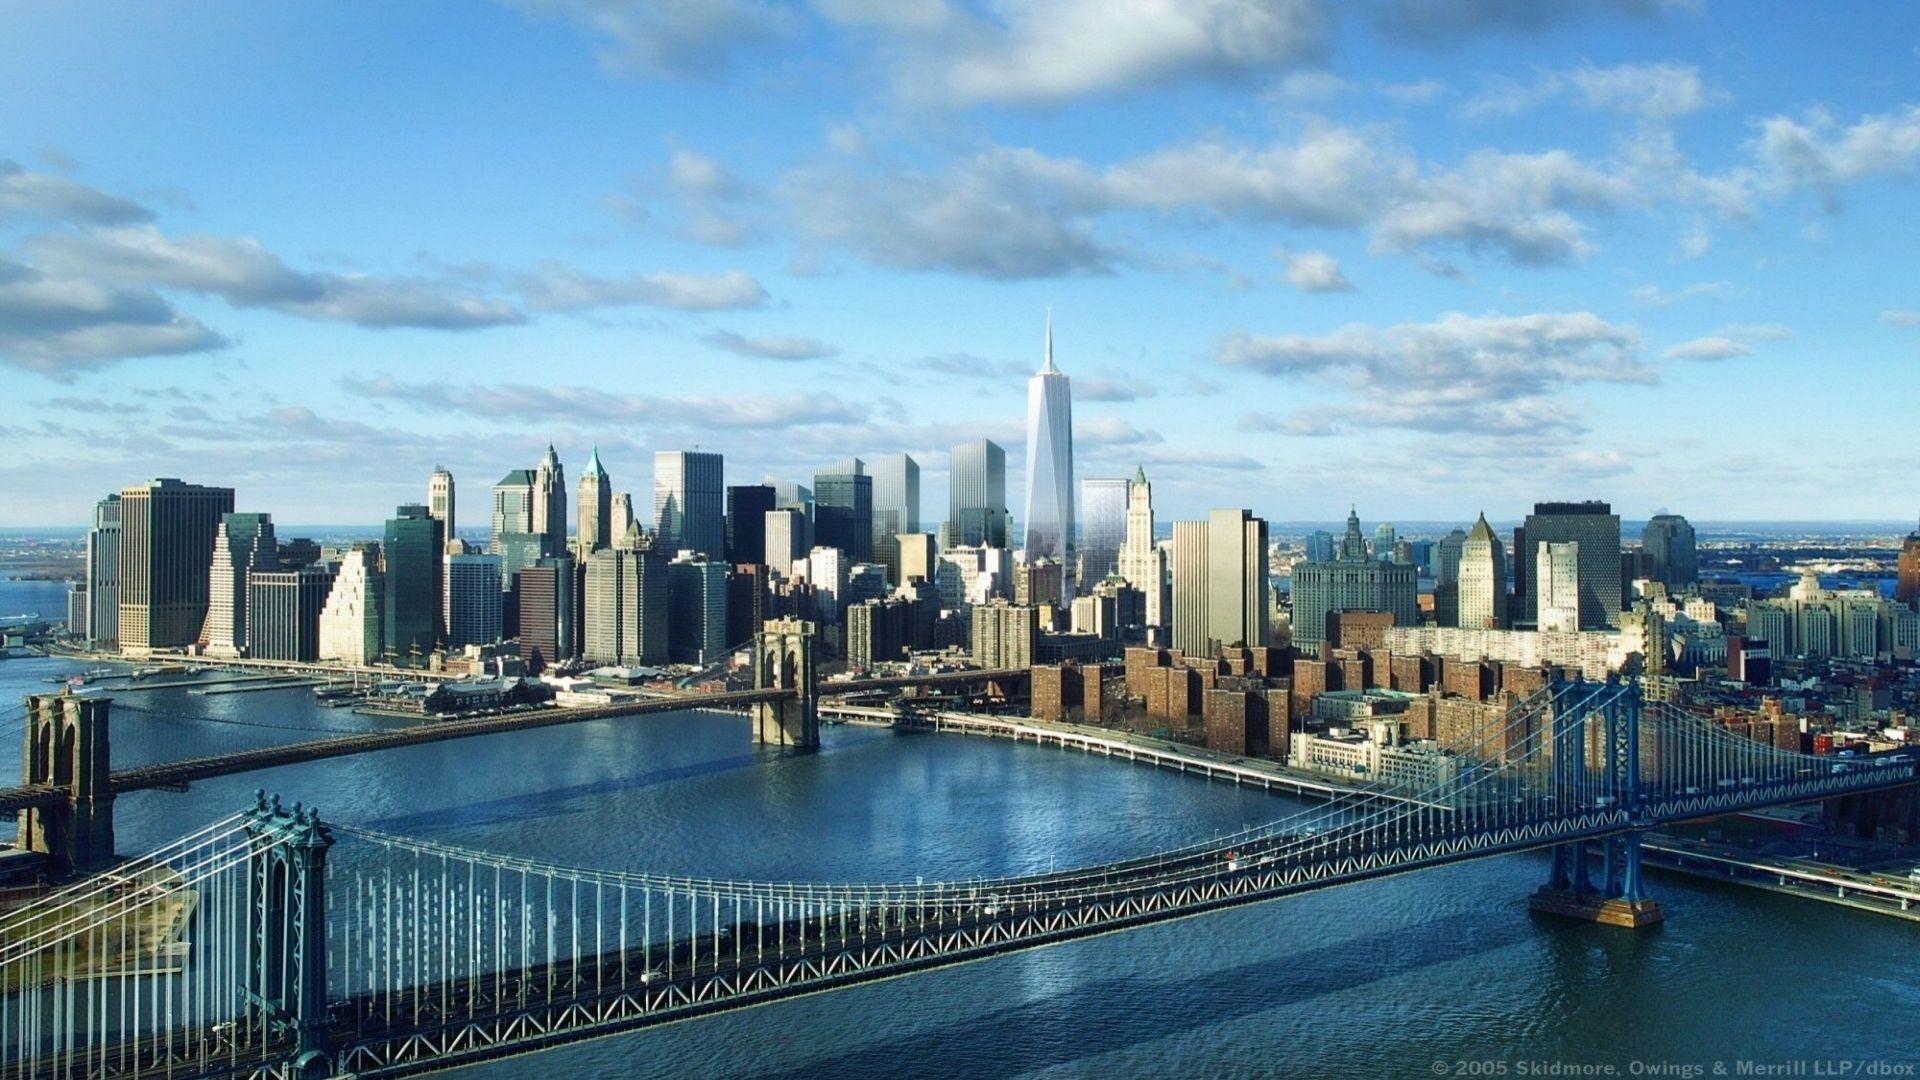 New York Hd Wallpaper 73 Images